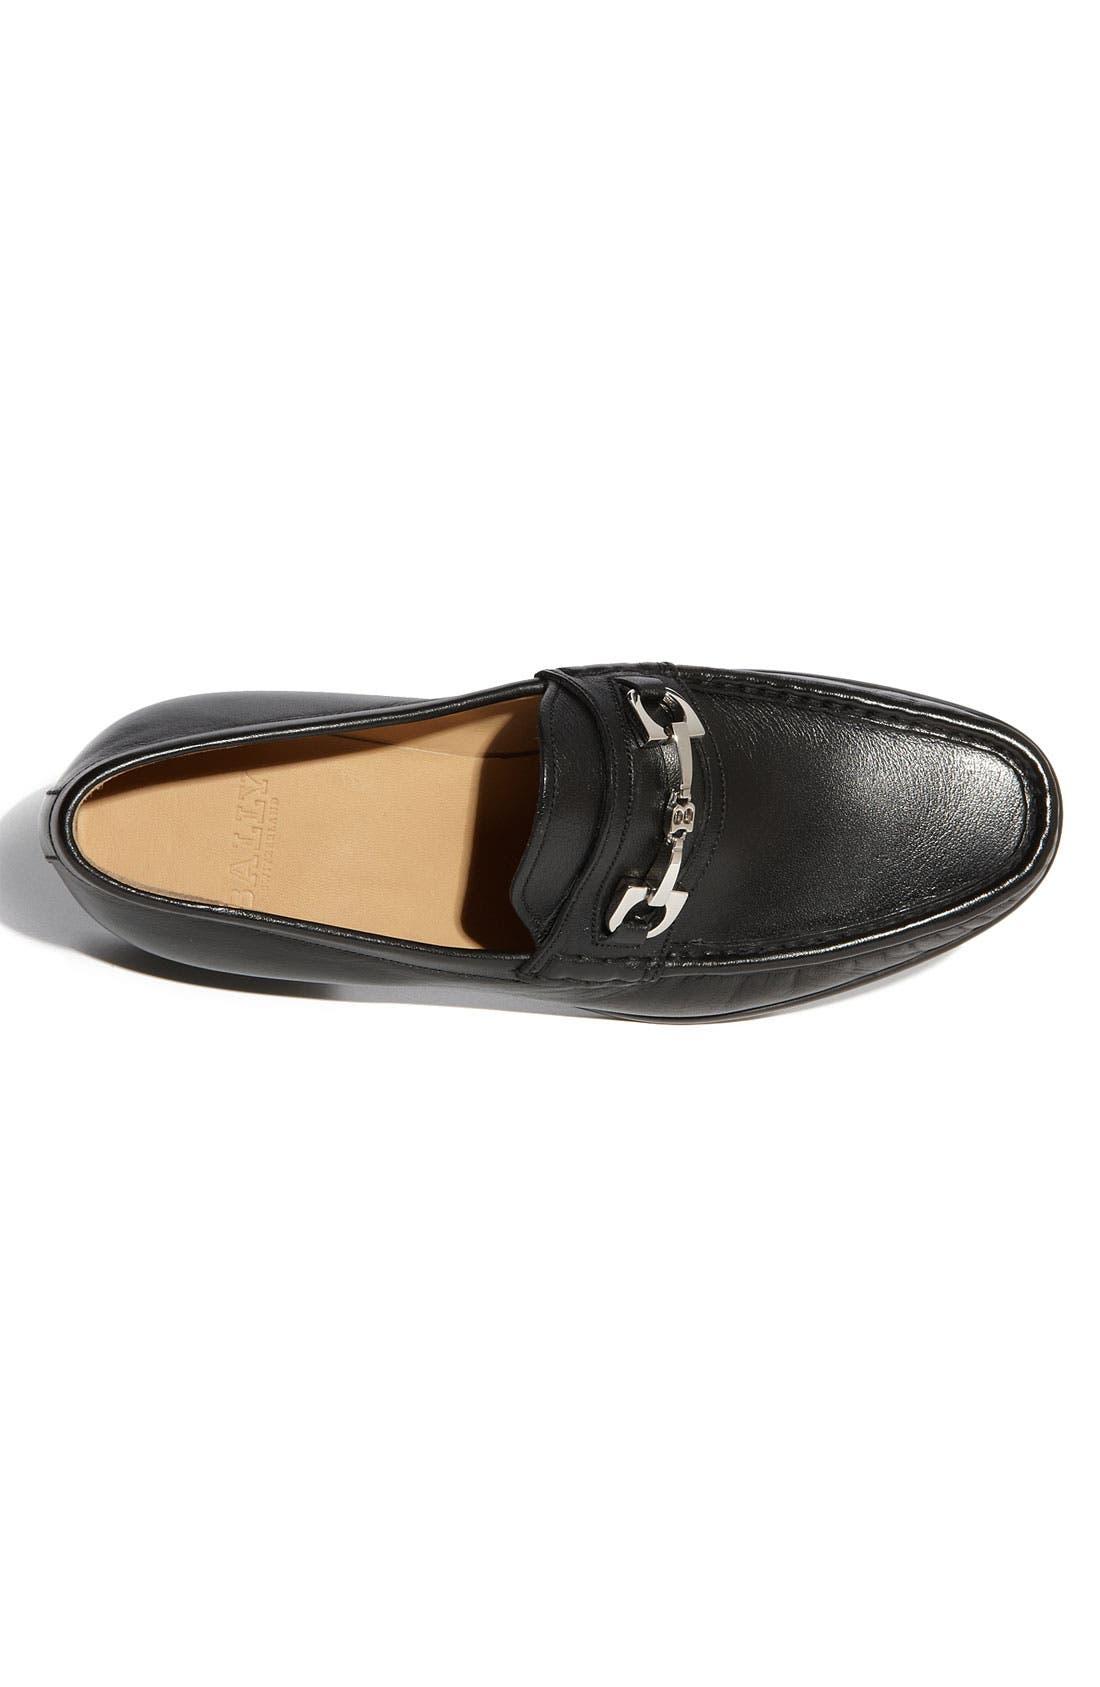 Alternate Image 3  - Bally 'Corman' Loafer